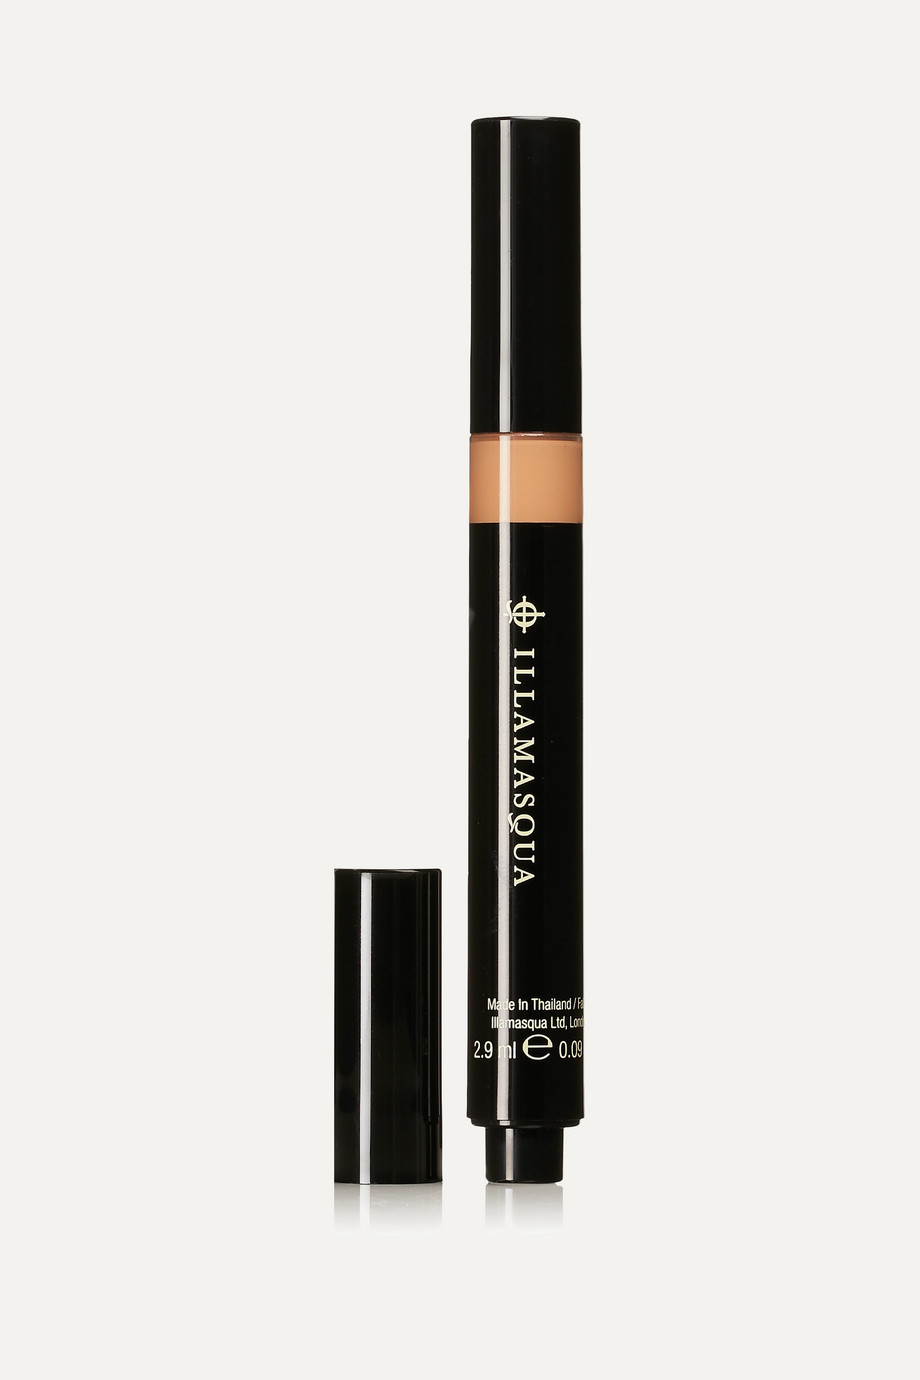 Illamasqua Skin Base Concealer Pen - Dark 1